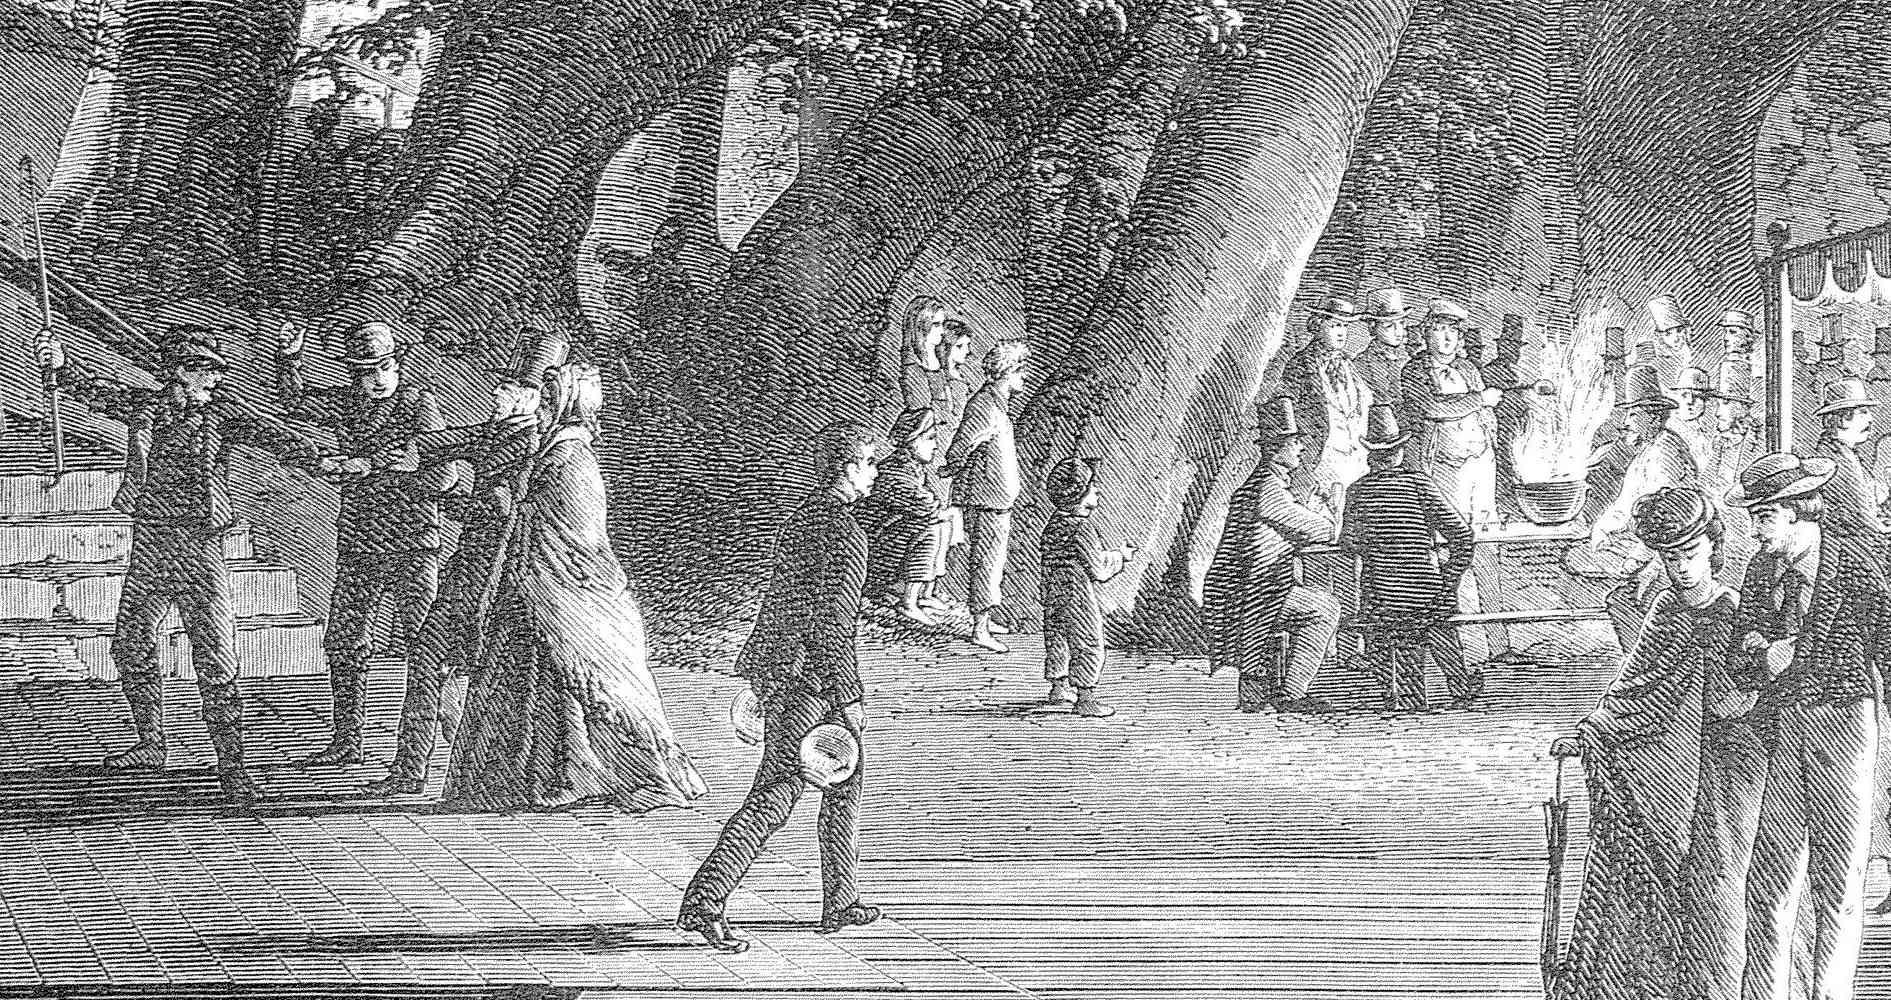 Historical 1867 image of Bakken amusement park